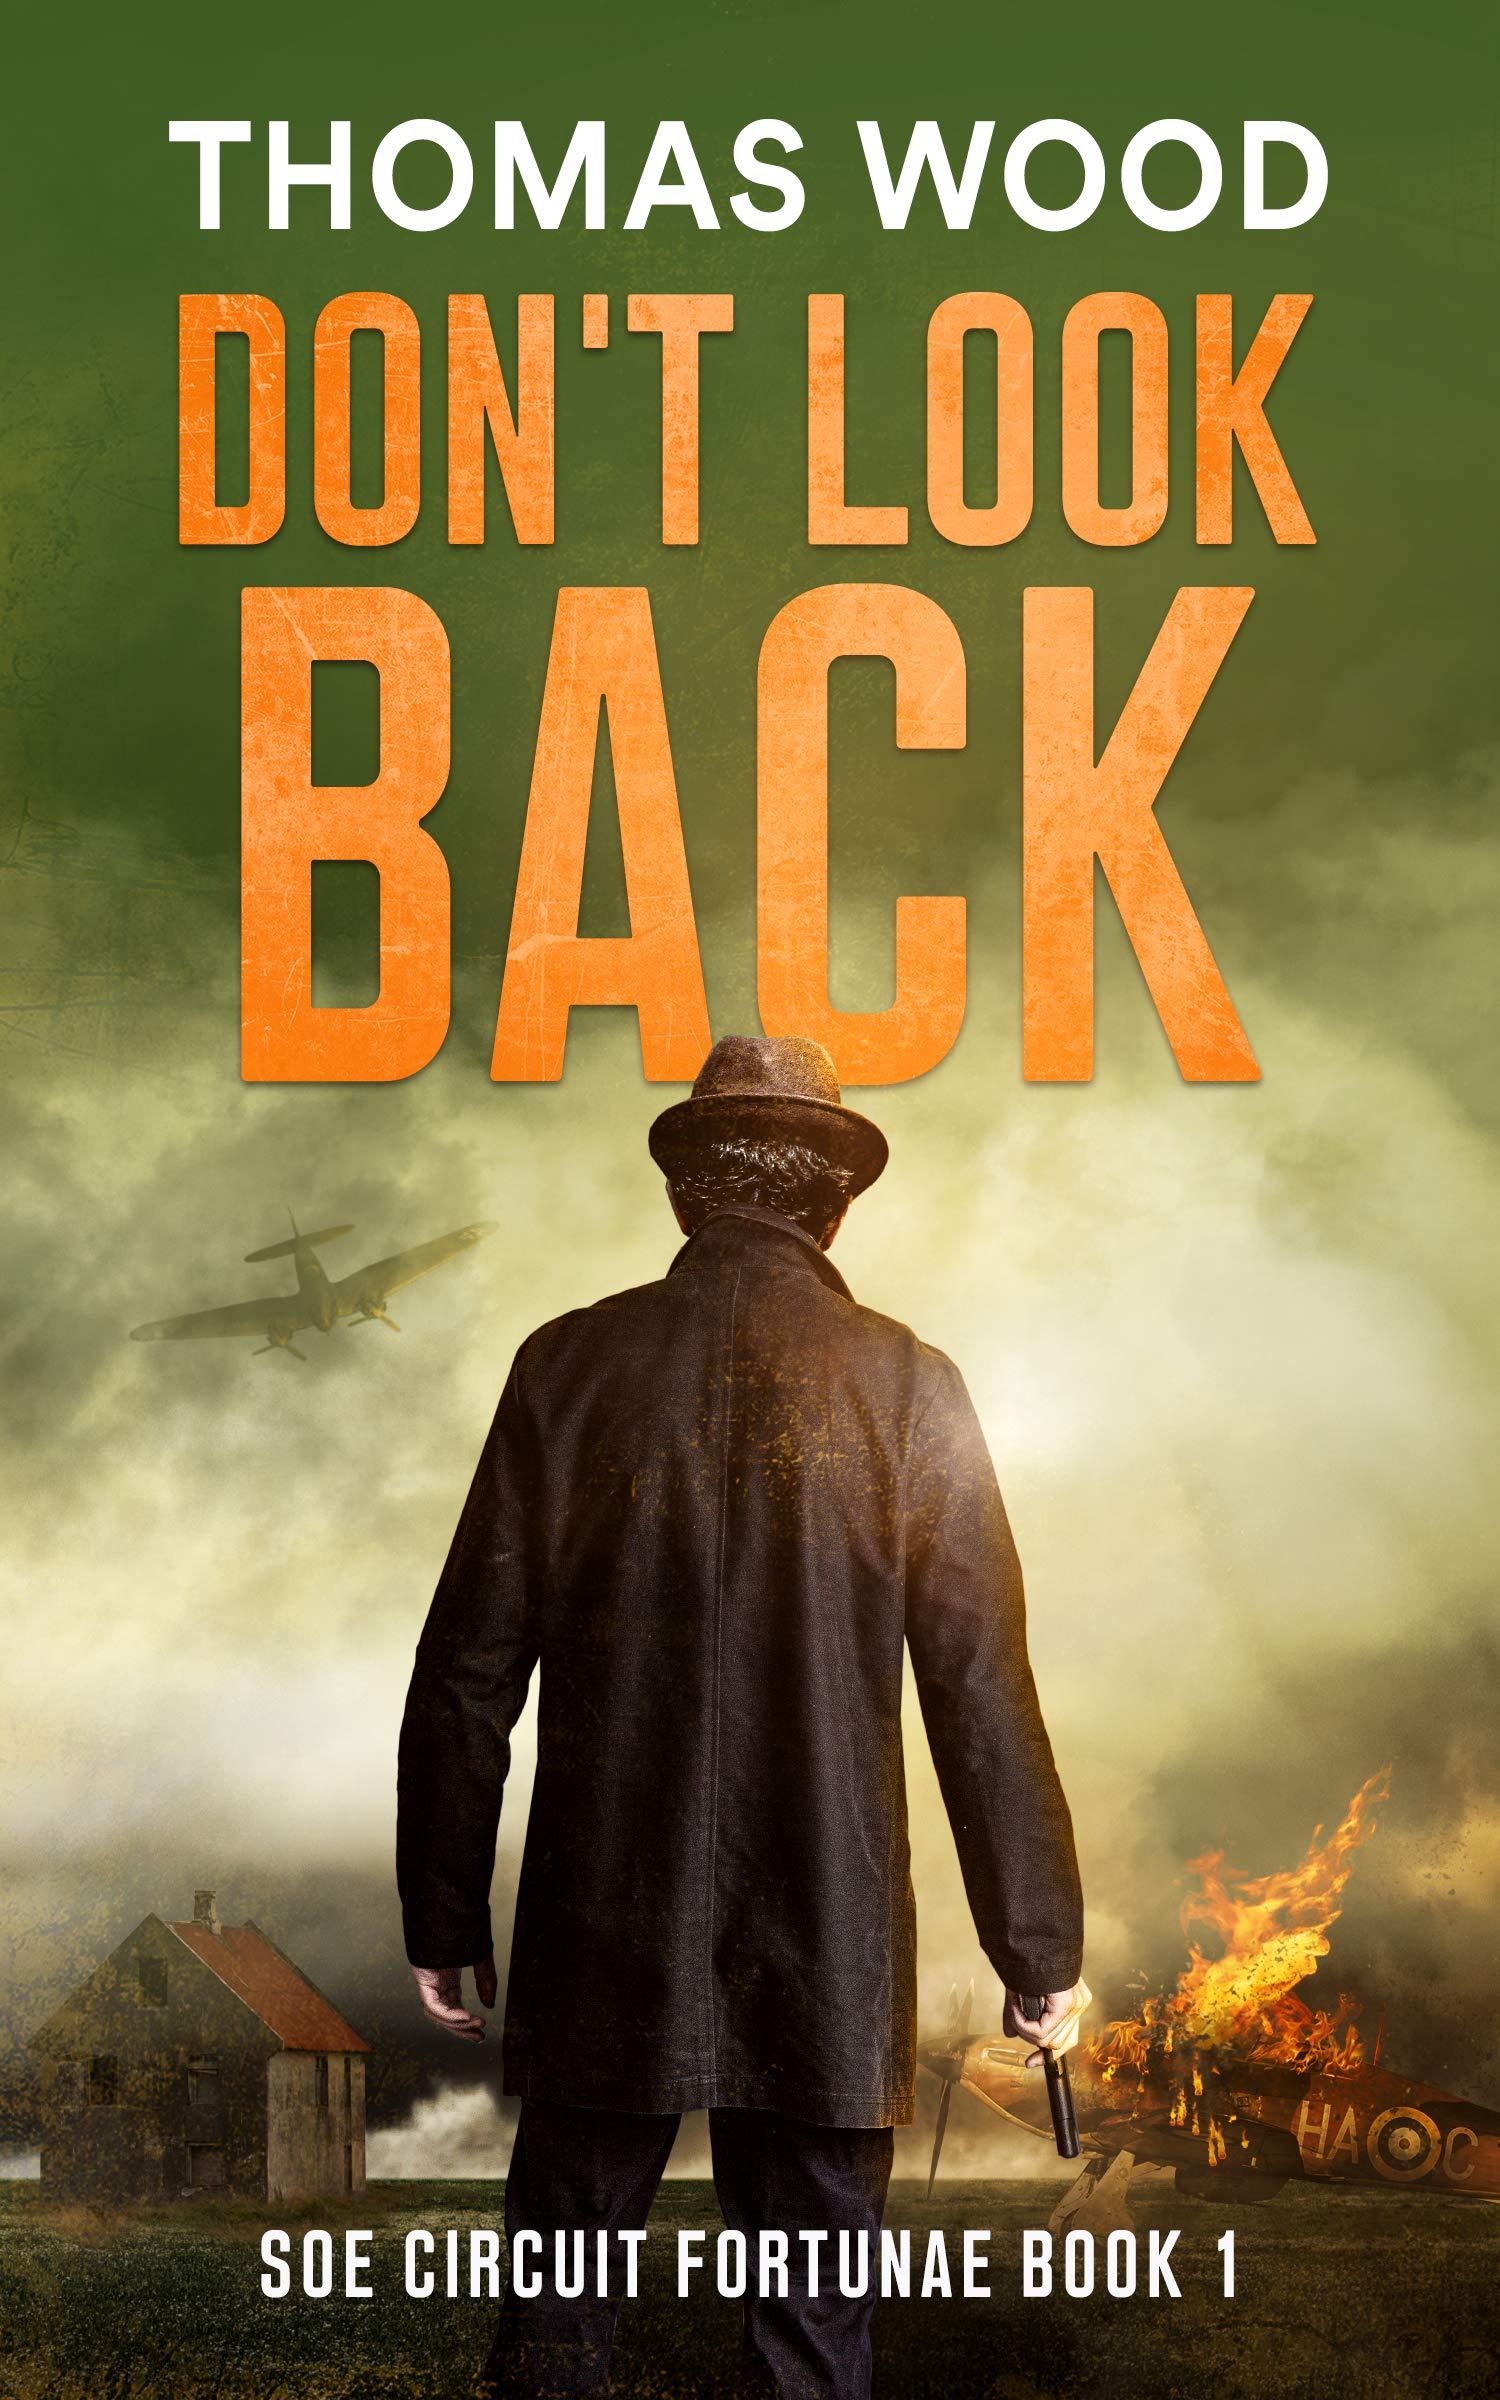 Don't Look Back: SOE Circuit Fortunae Book 1